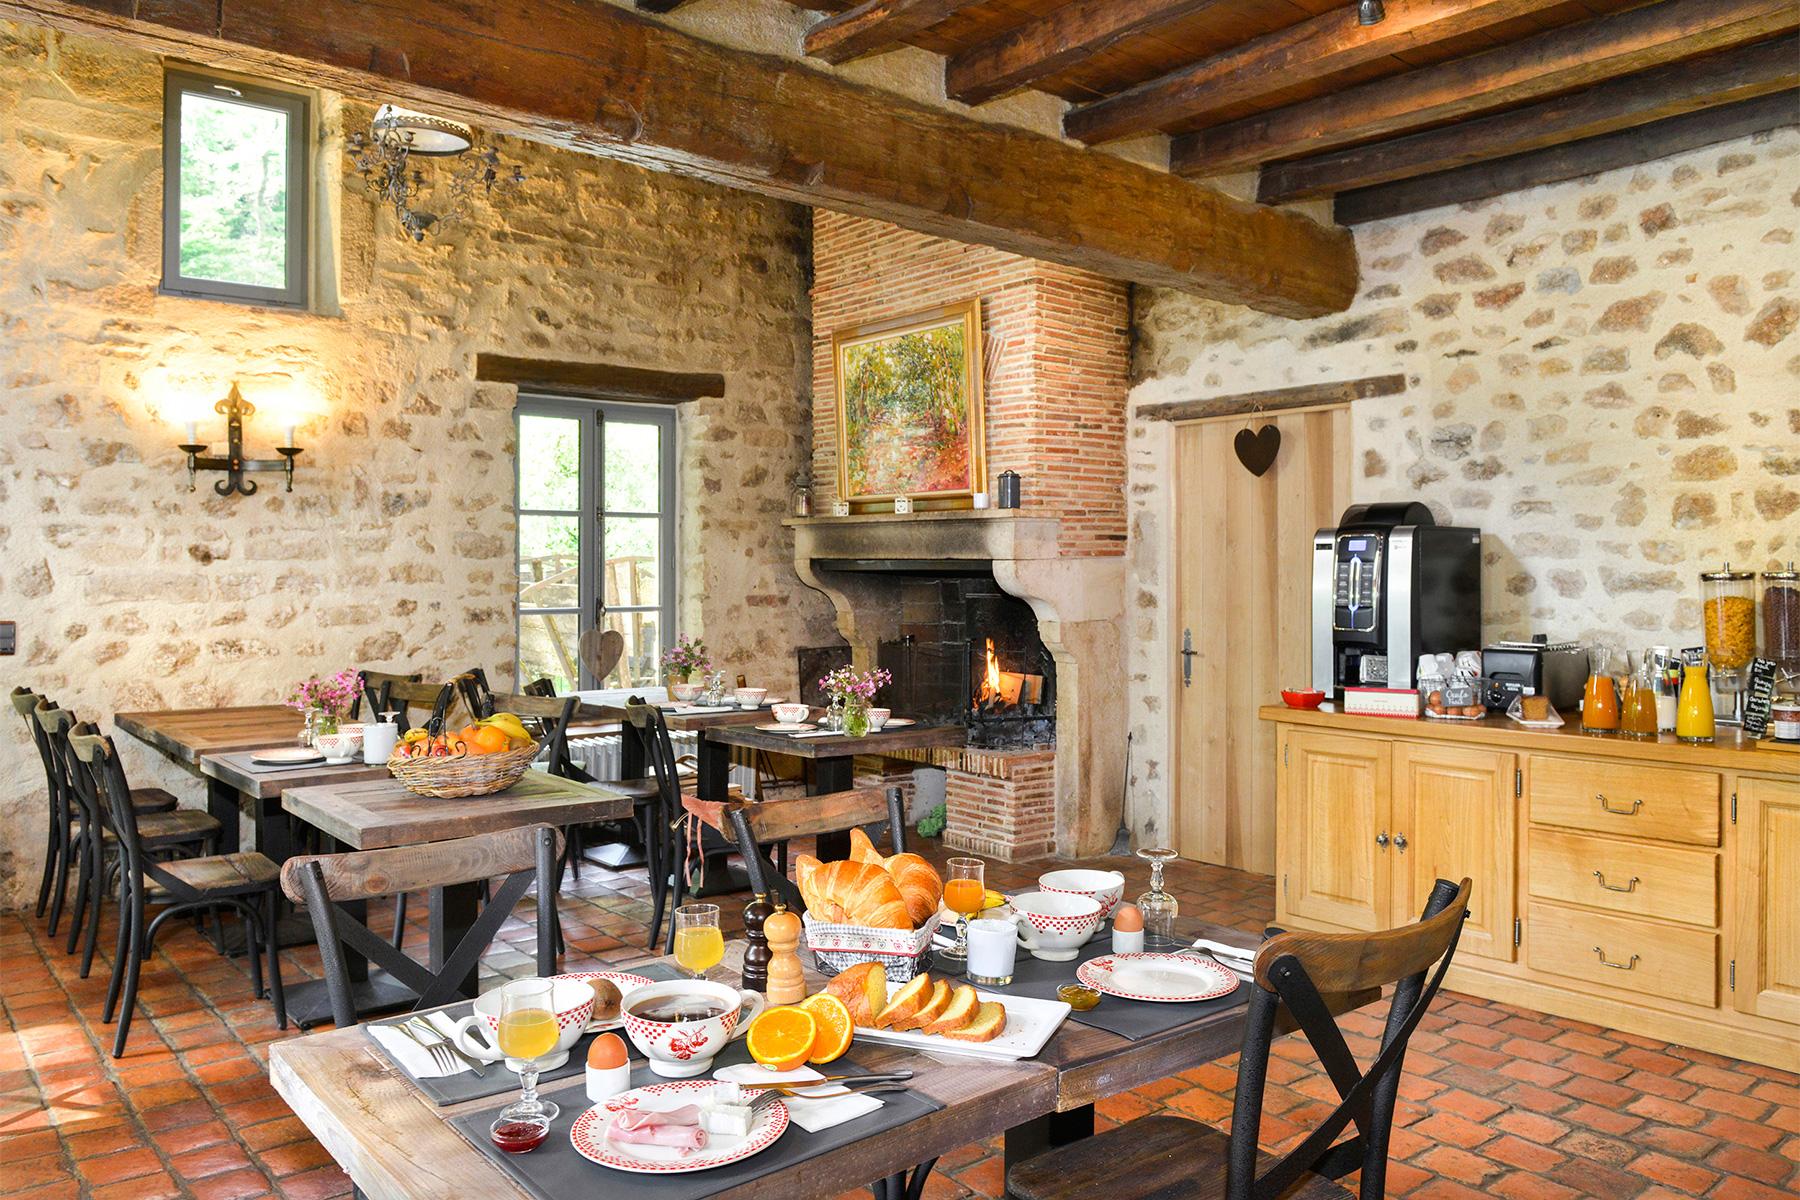 https://hotel-moulin-des-templiers.com/wp-content/uploads/2018/05/hotel-caractere-bourgogne-vezelay.jpg